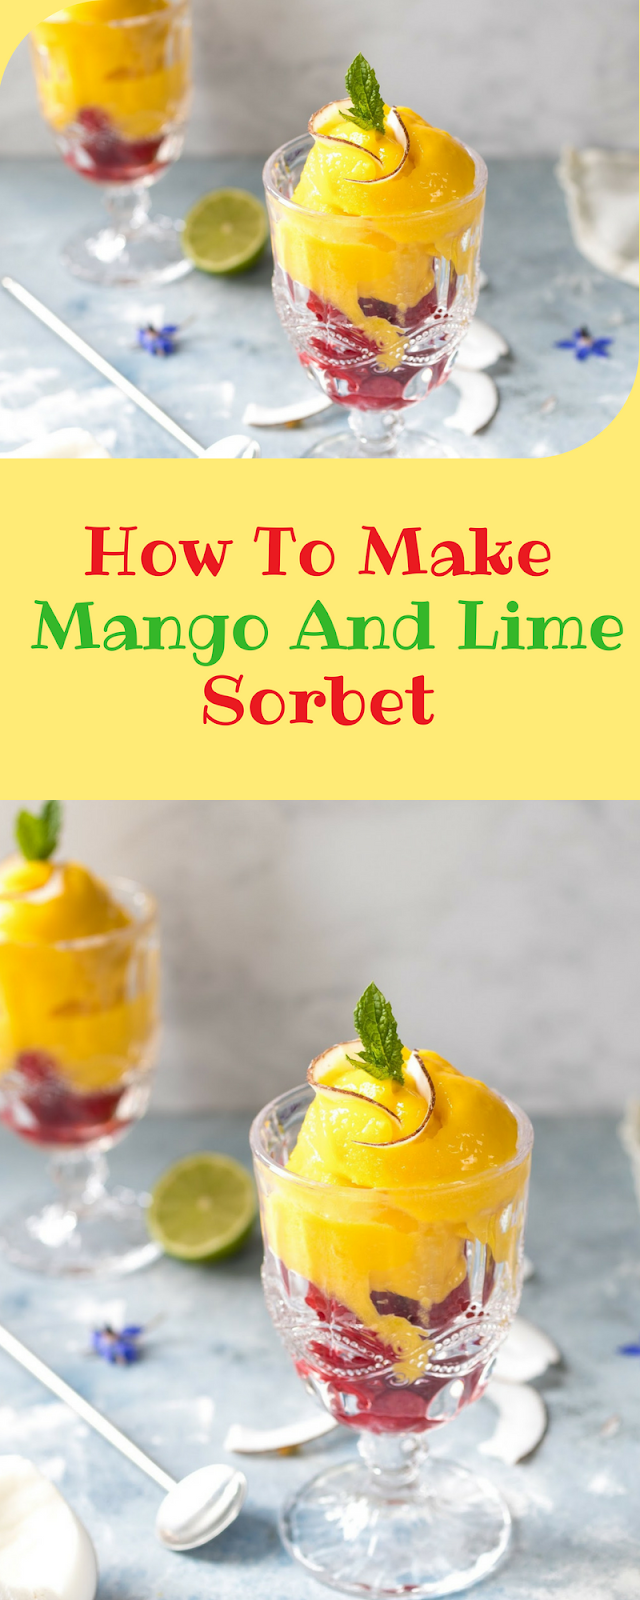 How To Make Mango And Lime Sorbet